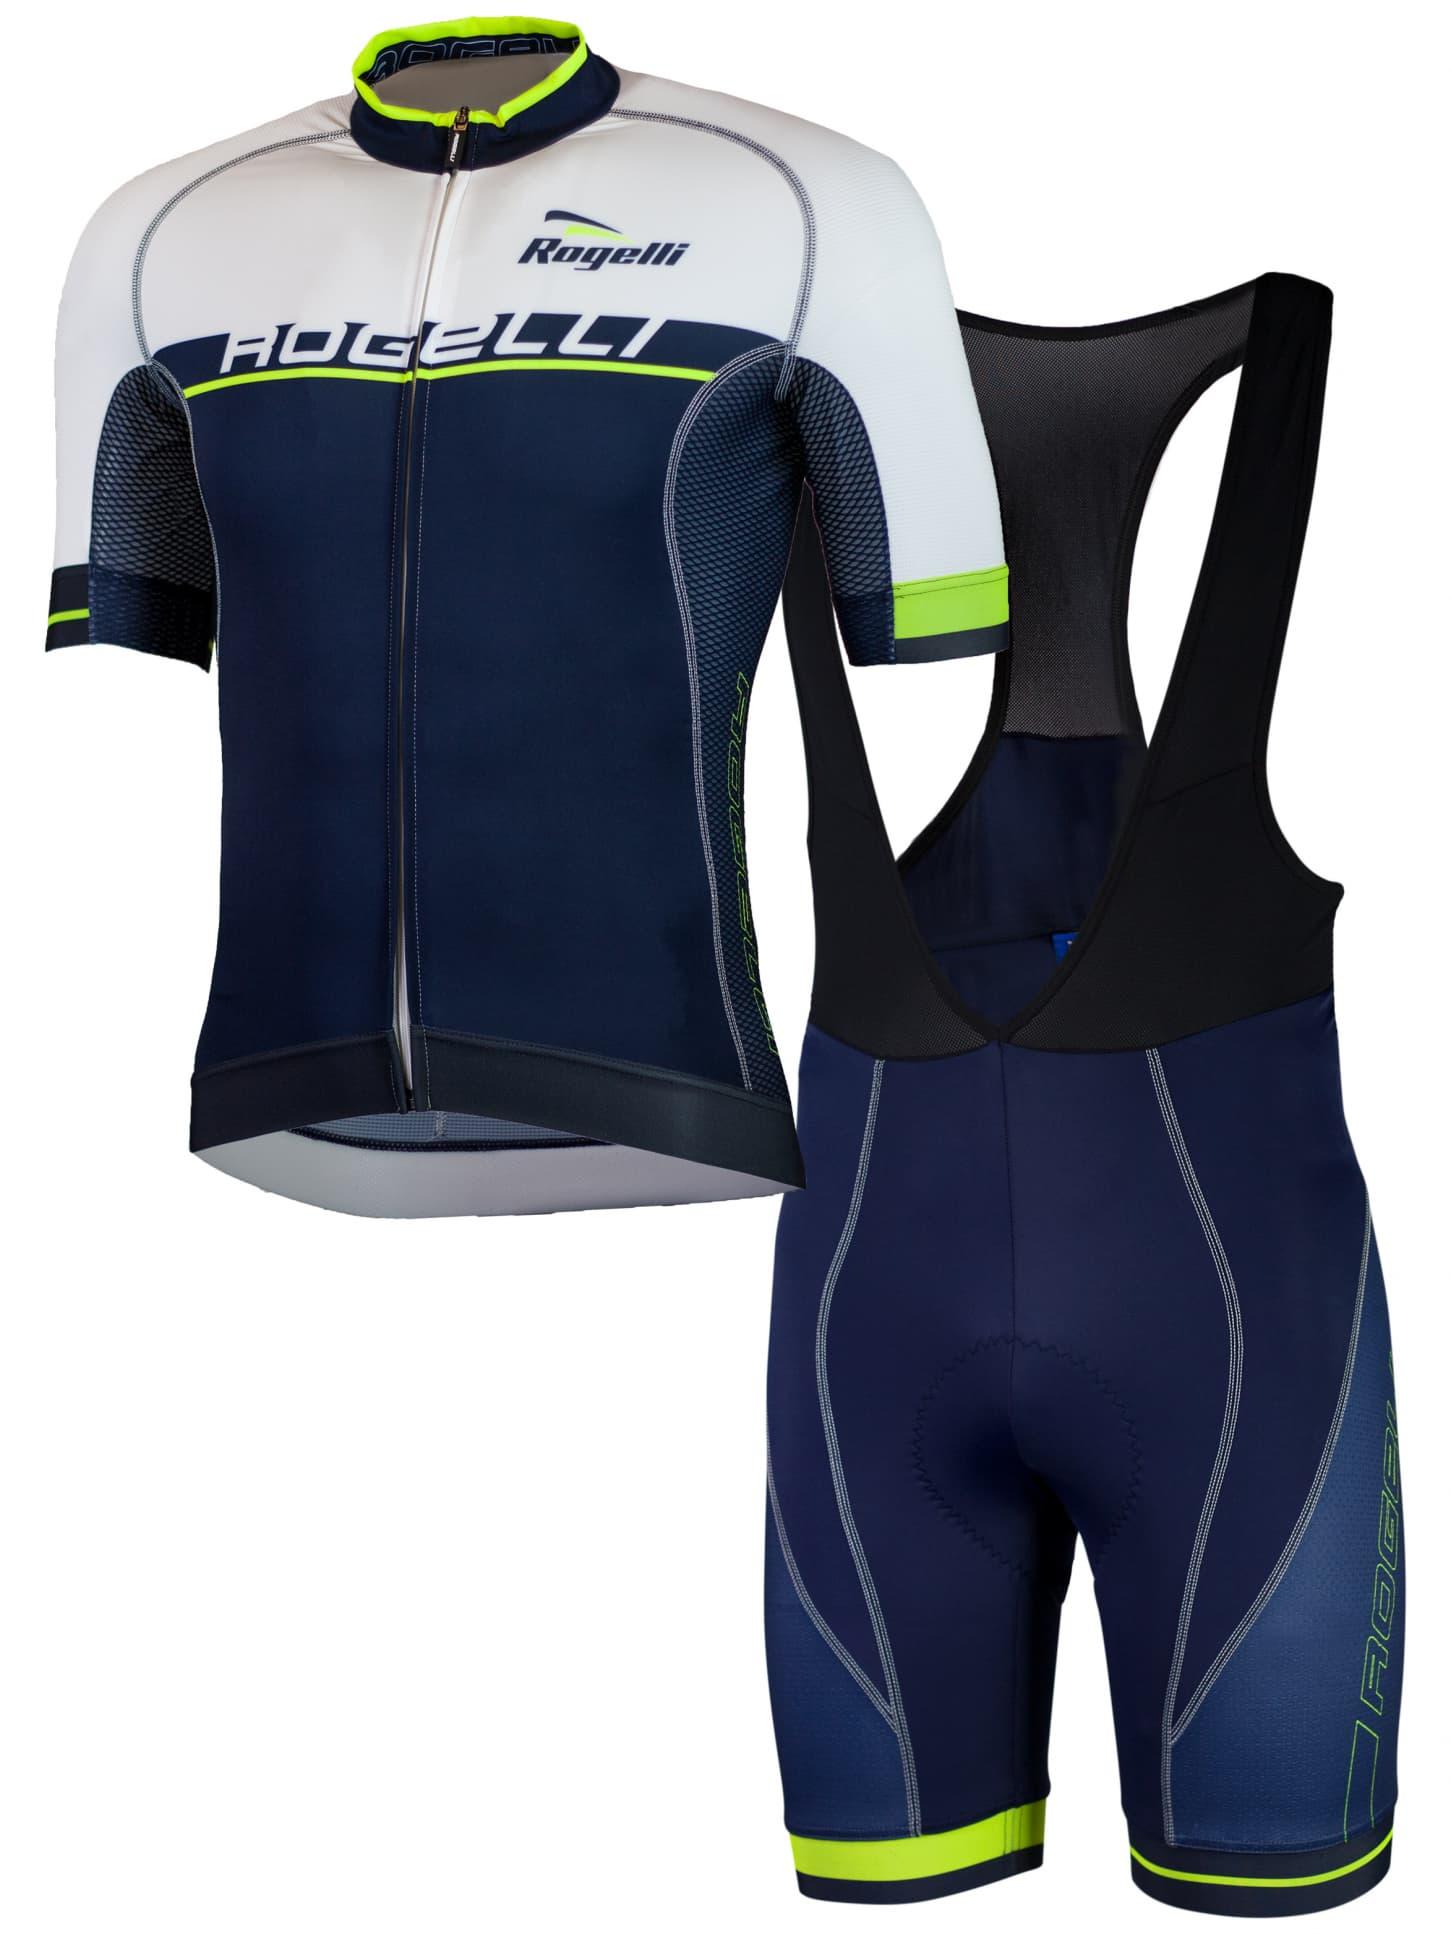 0f01bd456beda Cyklooblečenie Rogelli COMBATTIVO, modré | Rogelli.sk